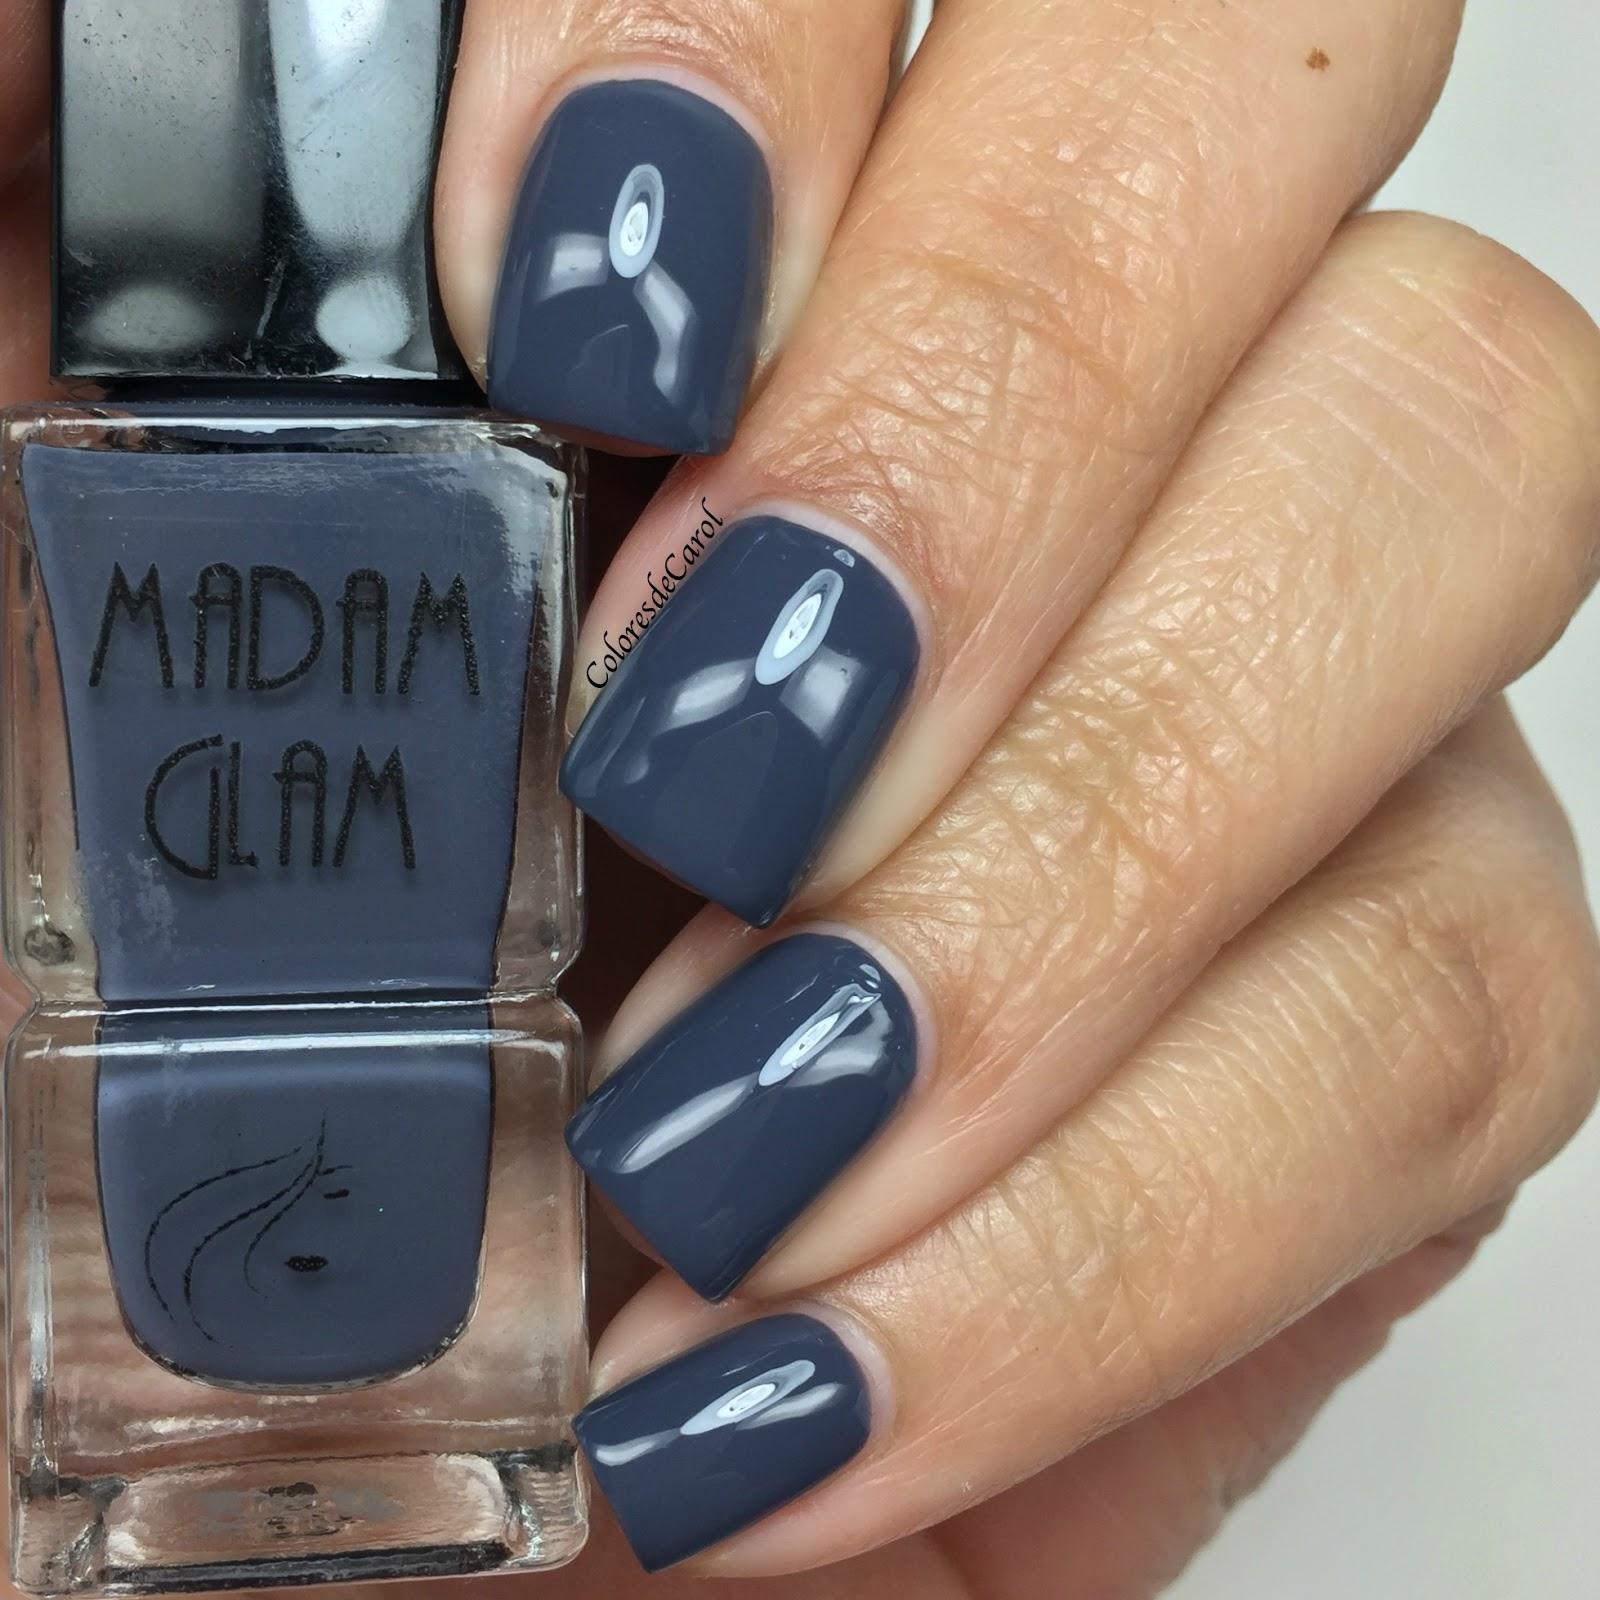 Colores de Carol: Madam Glam Nail Polish Swatches and Review